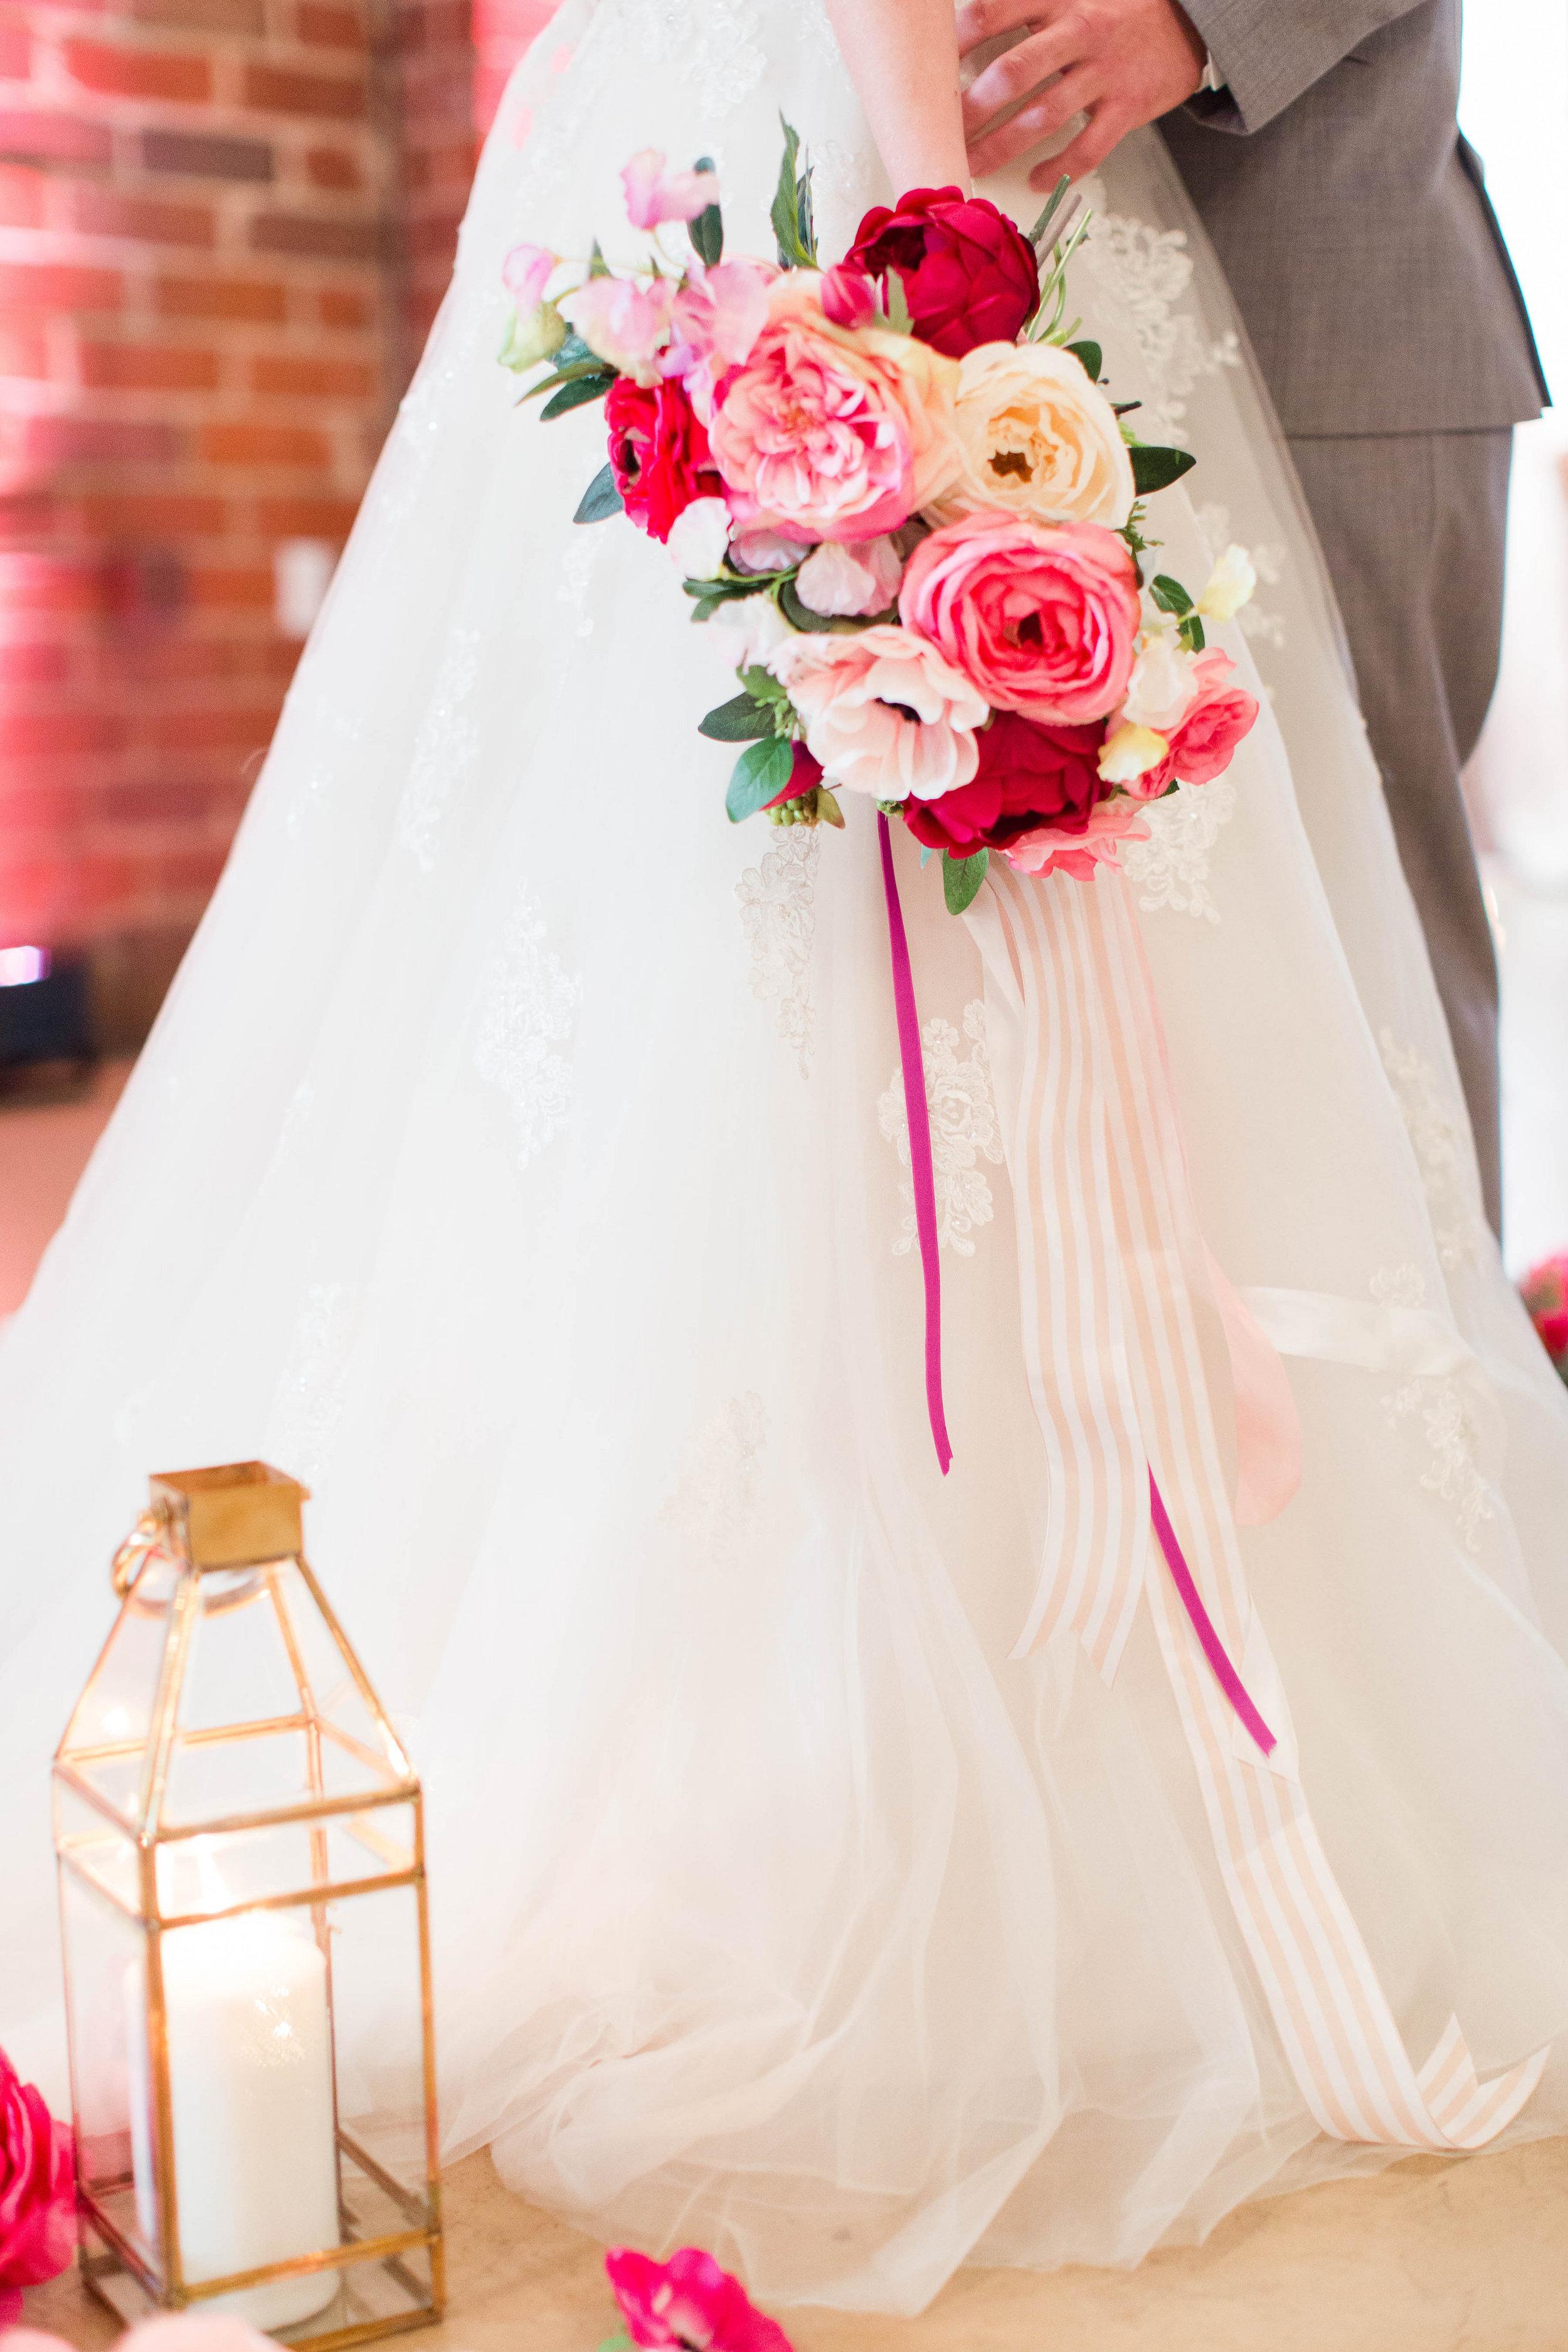 afloral-fake-flower-wedding-ivory-and-beau-bridal-boutique-maggie-sottero-saffron-the-hall-on-vine-wedding-statesboro-wedding-savannah-wedding-kristian-designs-rachel-strickland-photography-savannah-bridal-southern-bride-savannah-bride-12.jpg